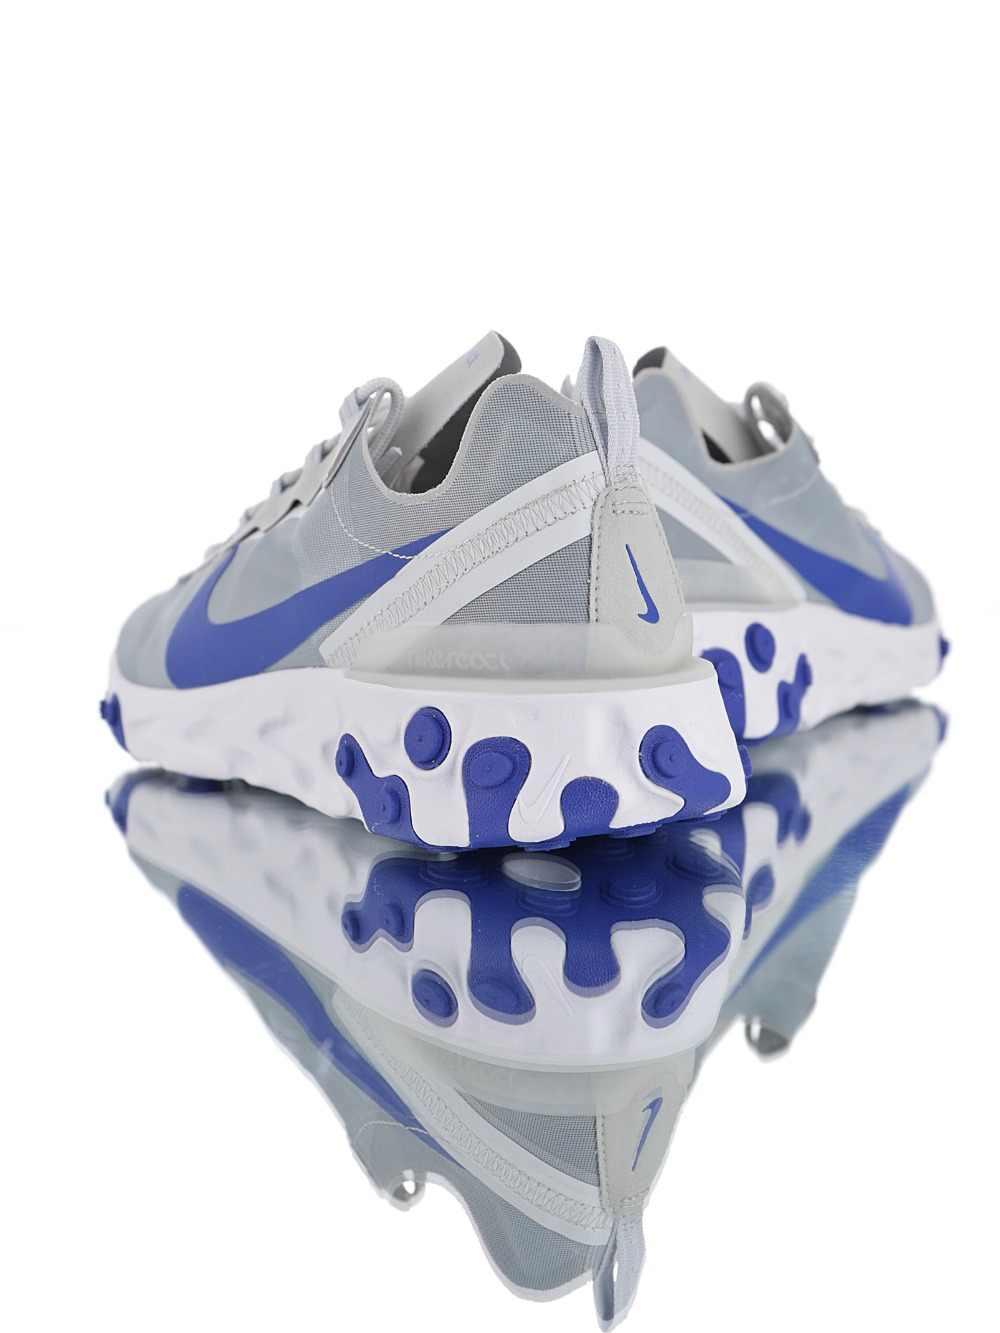 5173b8231d026 ... Nike React Element 55 Women s Running Shoes Original Outdoor Sports  Shoes Shock Absorption Non-slip